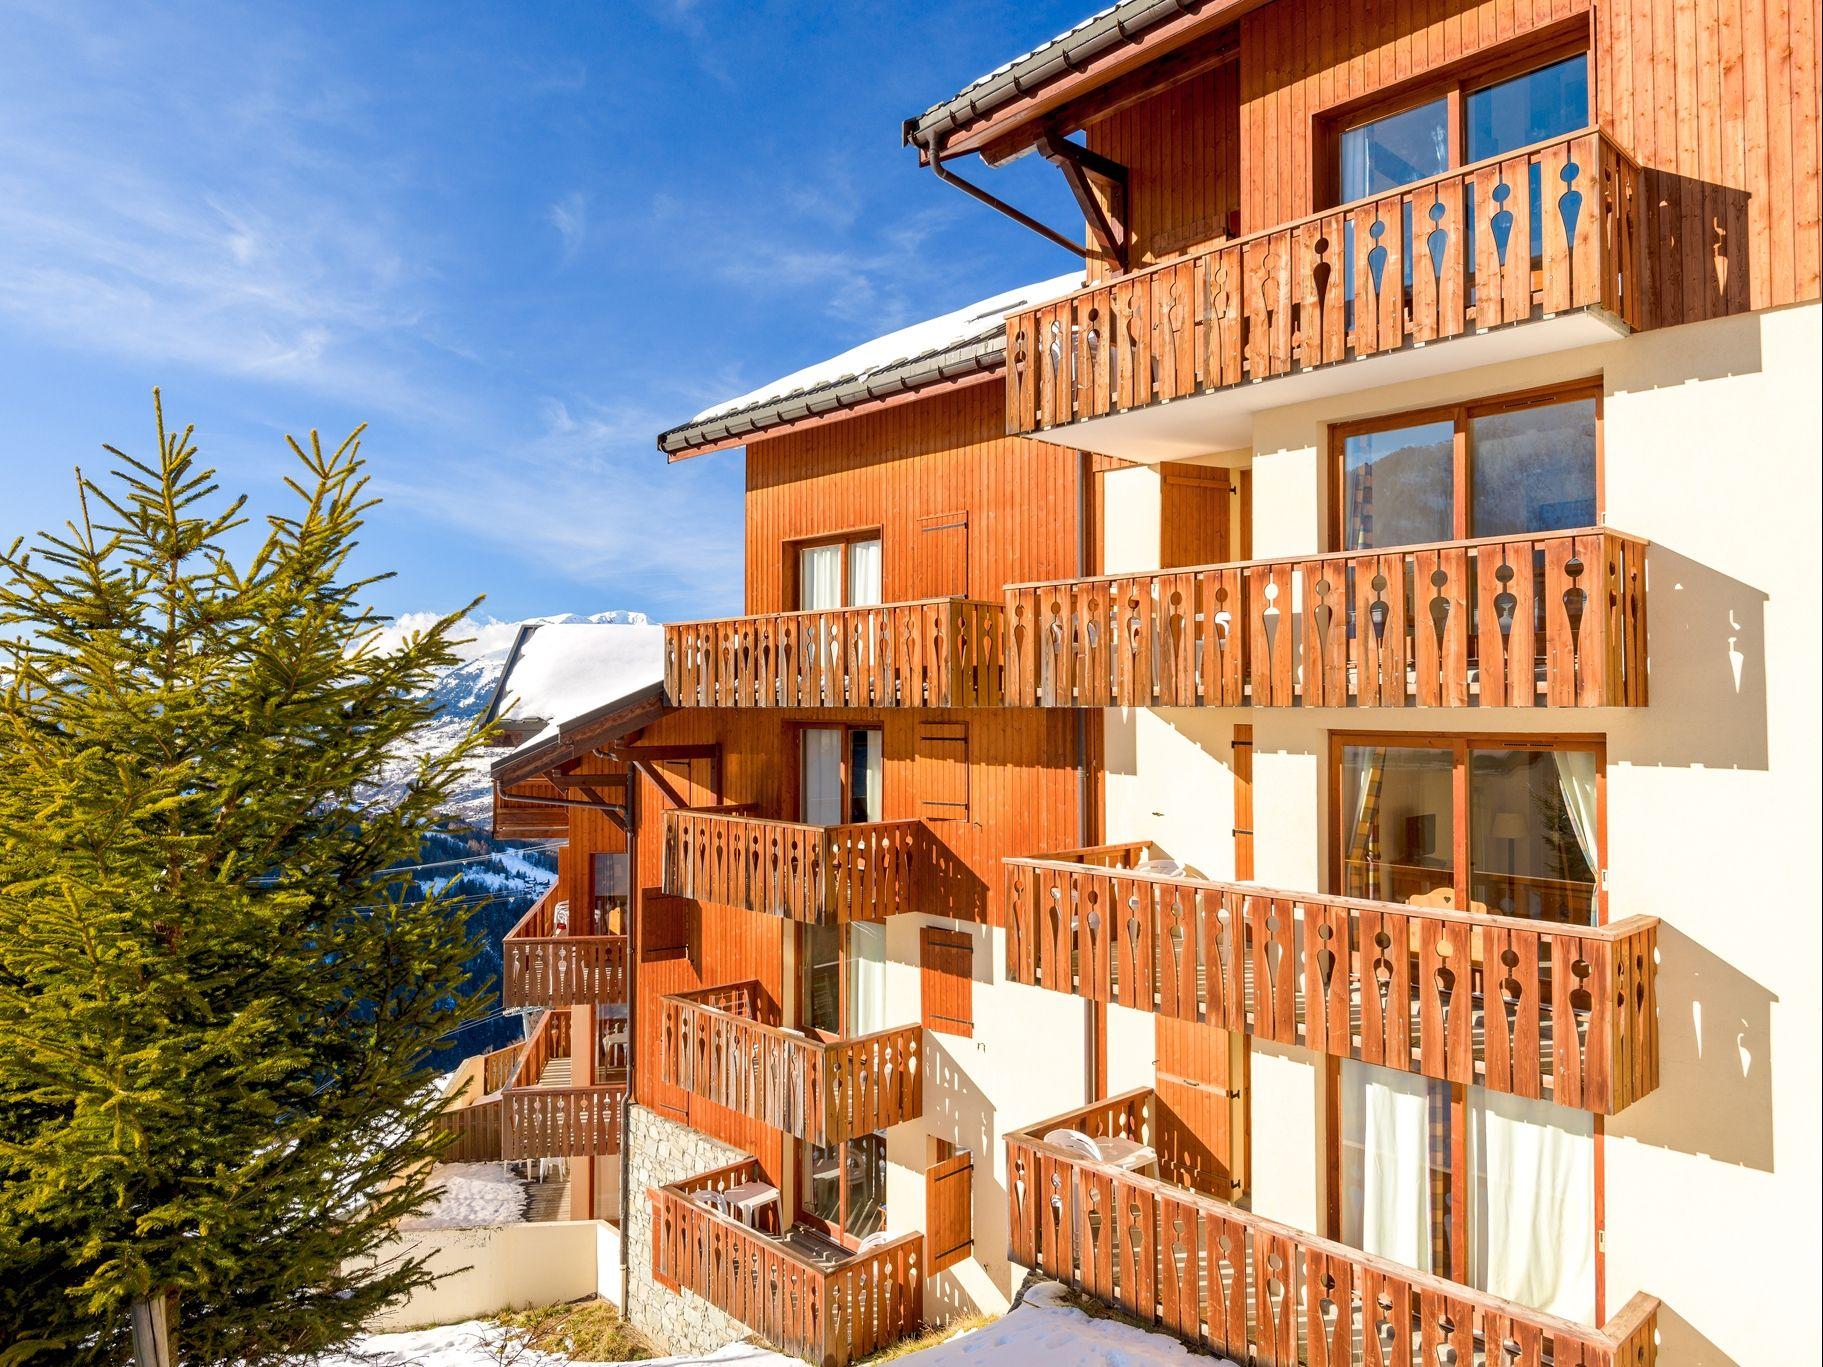 Appartement Résidence L'Arollaie - 6-8 personen